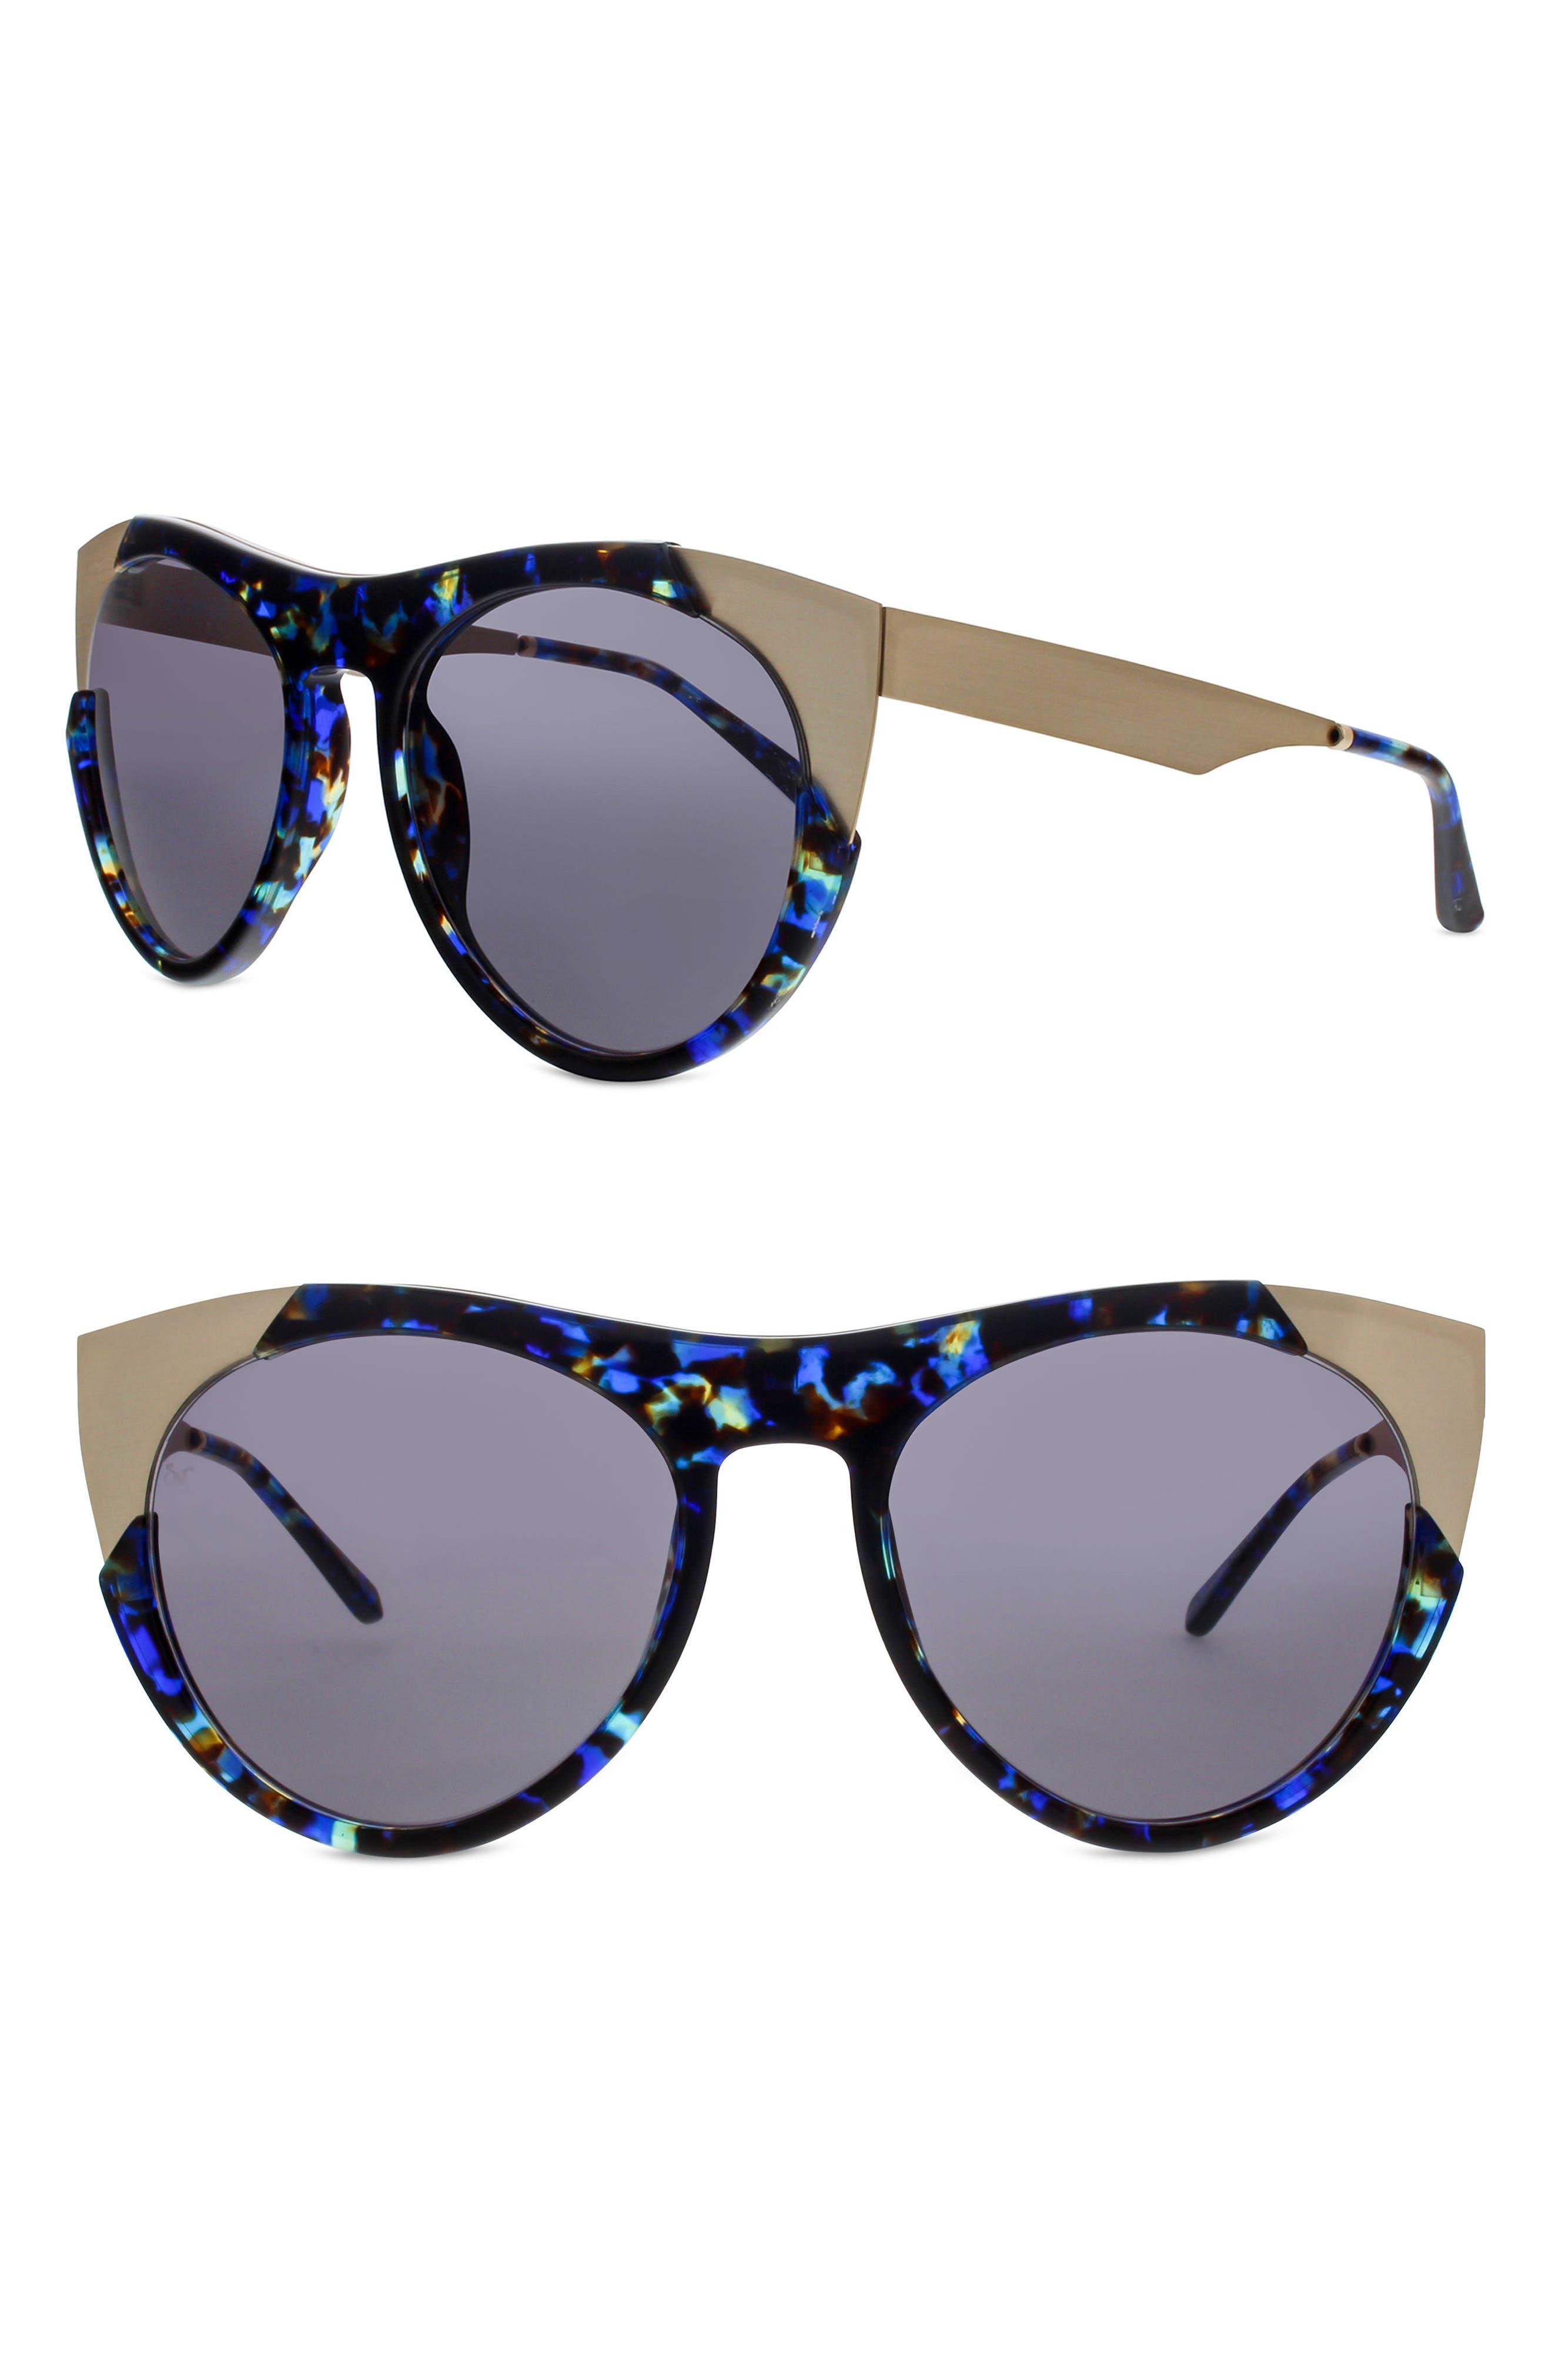 Zoubisou 53mm Cat Eye Sunglasses,                         Main,                         color, Blue Glam/ Brushed Gold